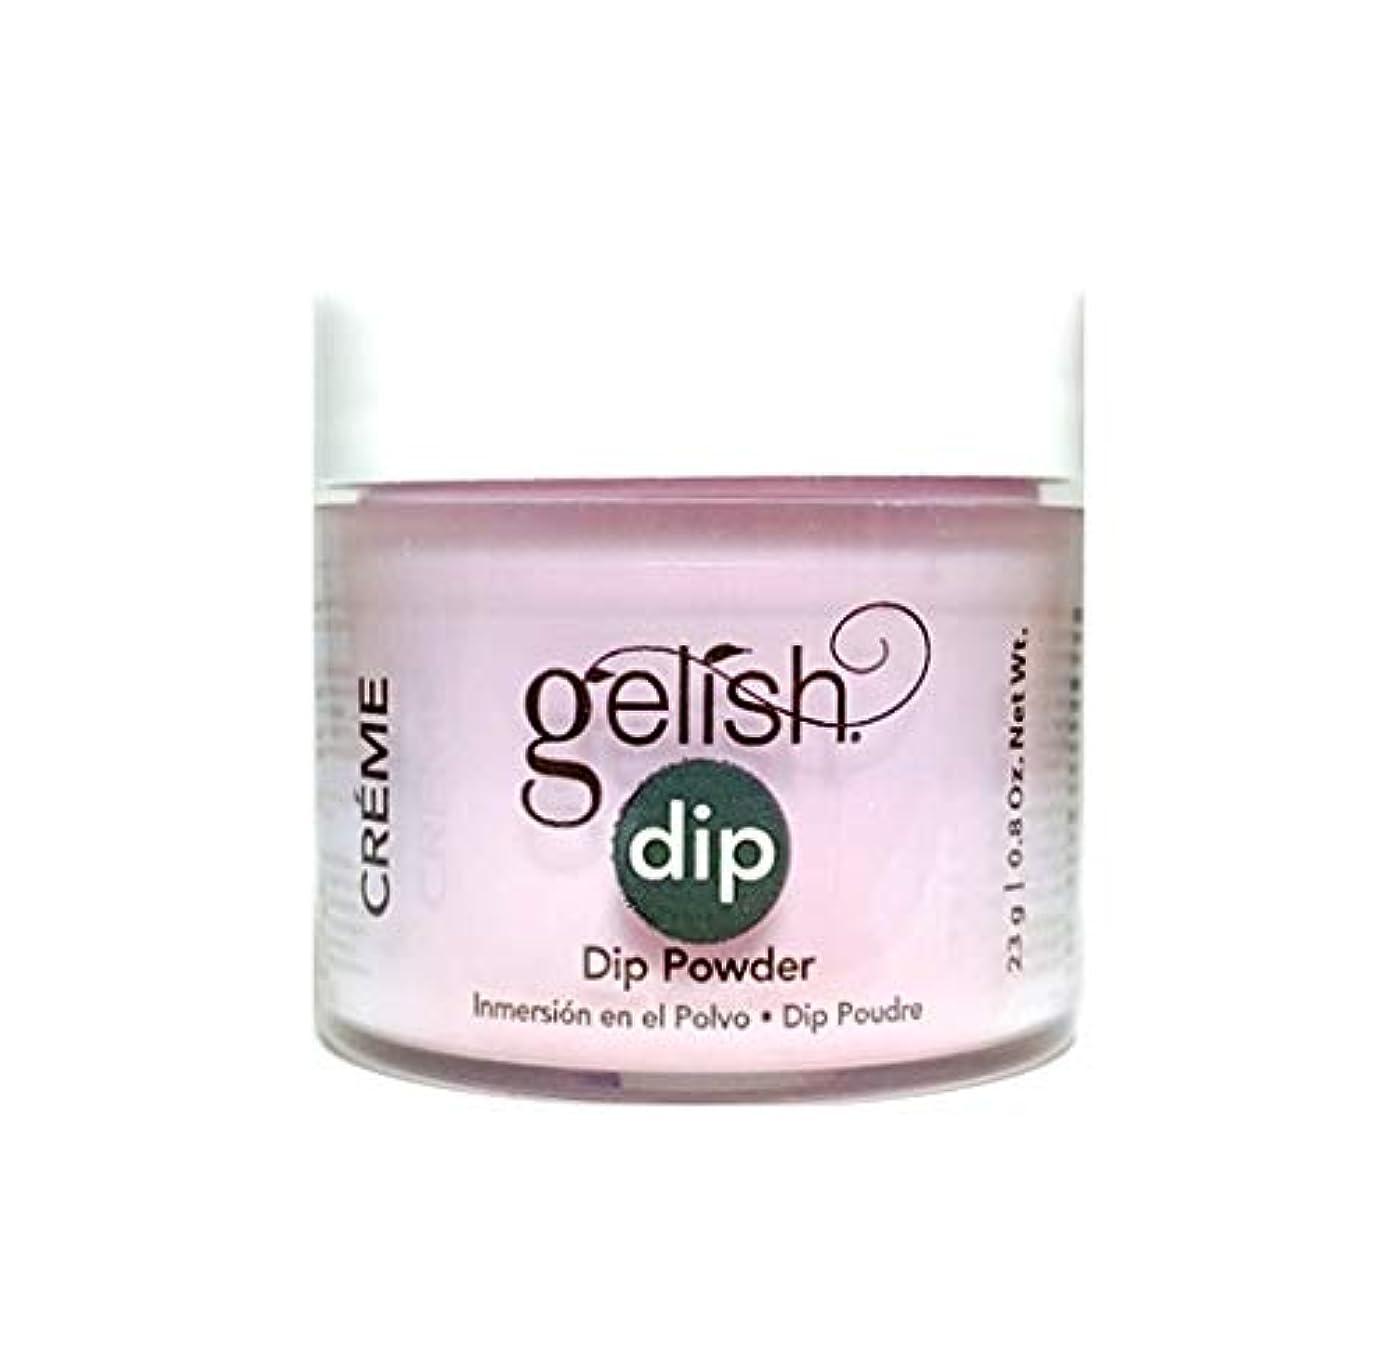 風味潜水艦精緻化Harmony Gelish - Dip Powder - It's A Lily - 23g / 0.8oz